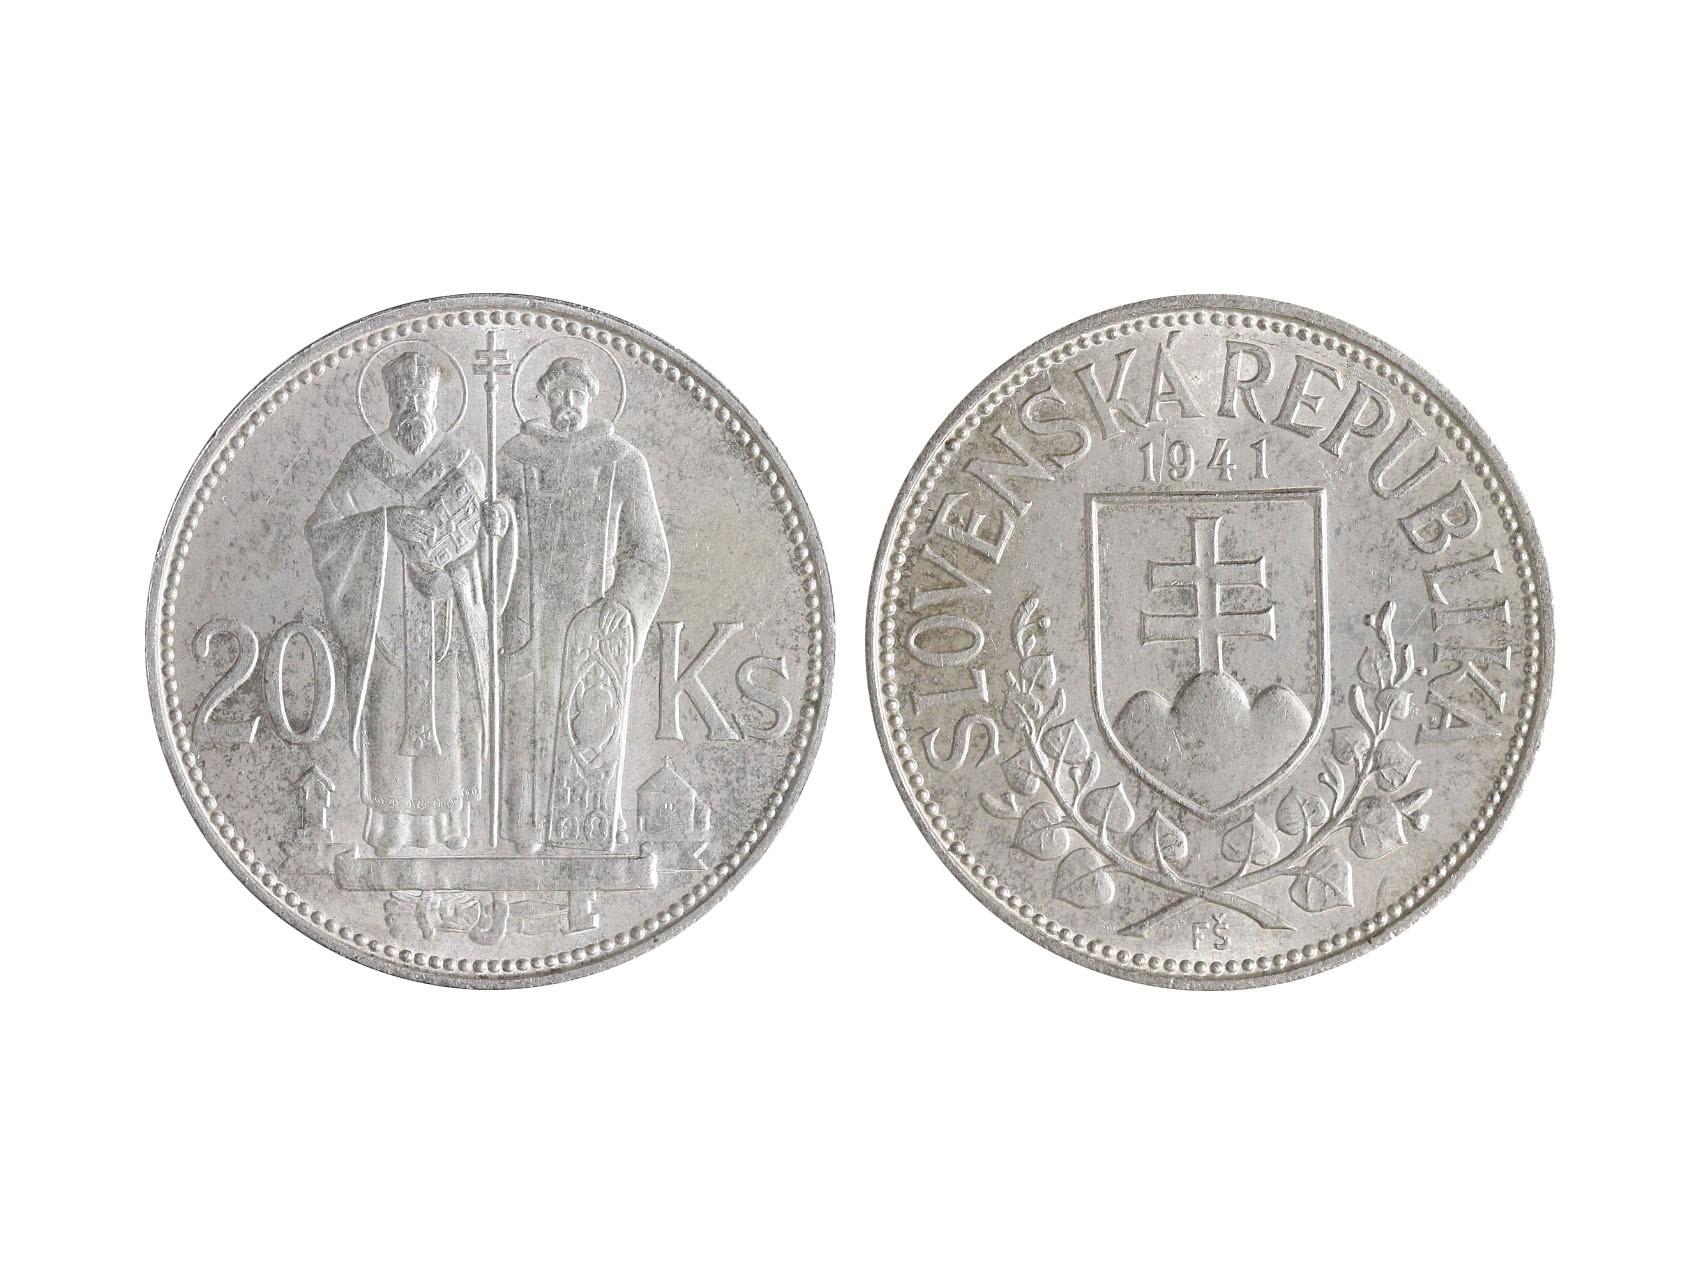 Slovenská Republika 1939-1945 - 20 Koruna 1941 varianta dvojkríž, N33v